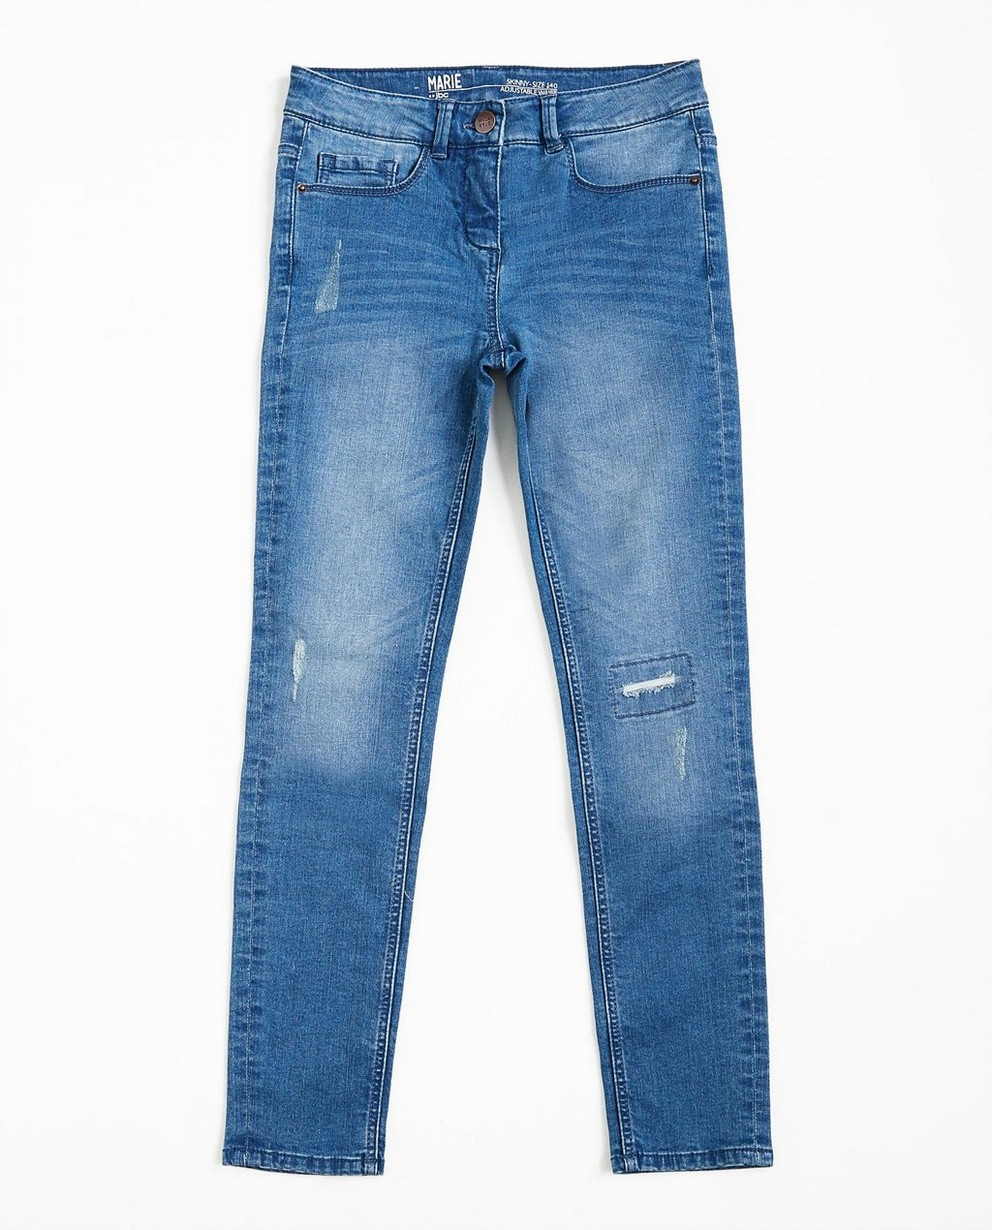 Jeans - BLM - Destroyed skinny jeans